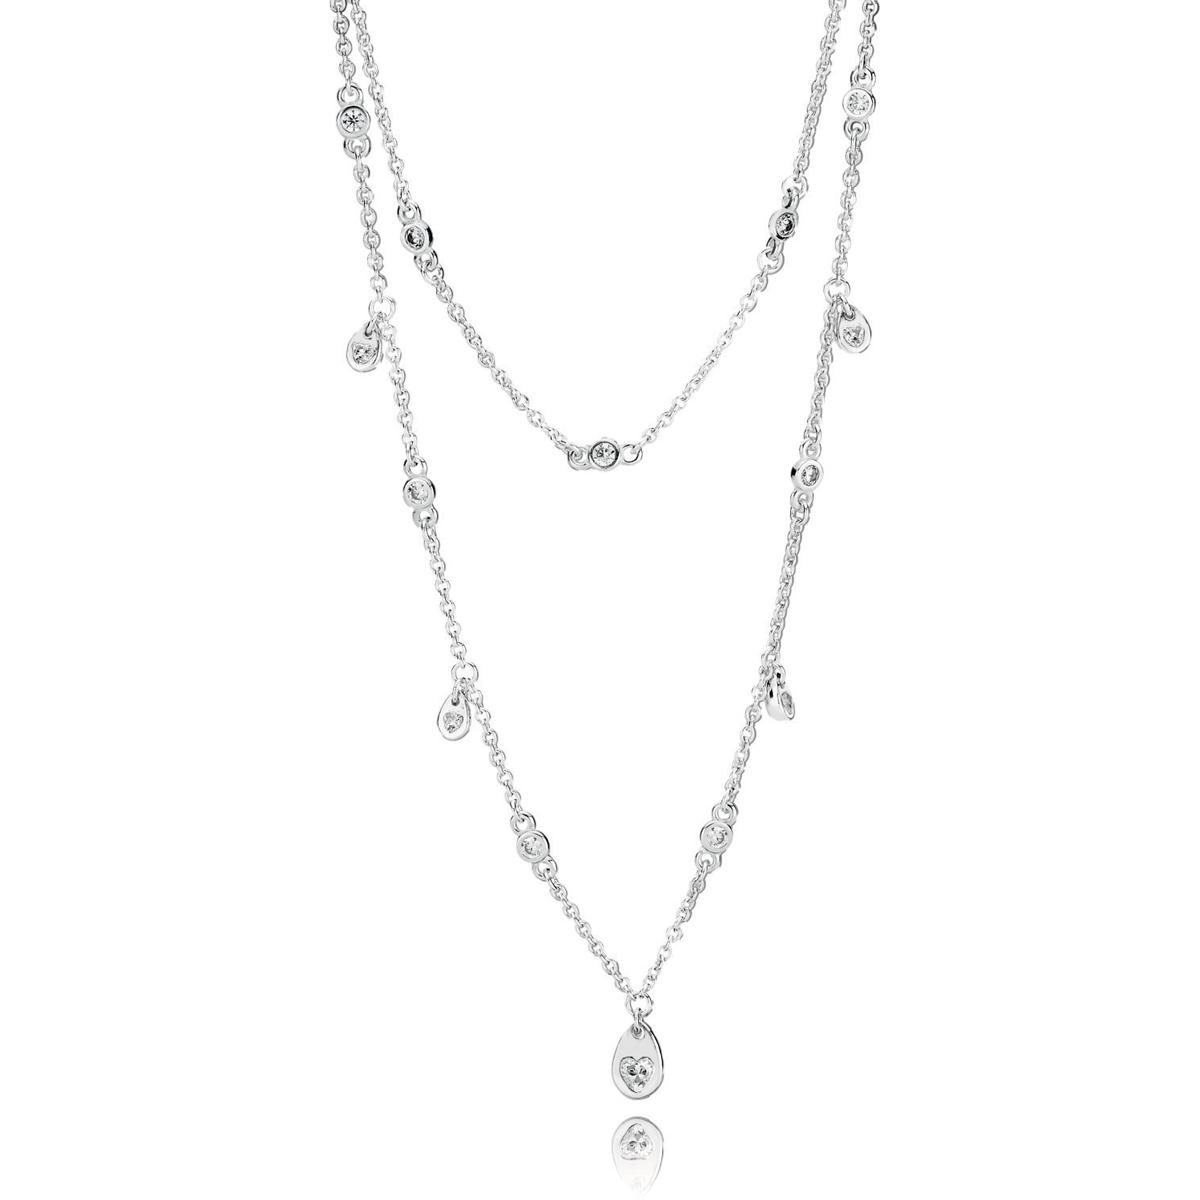 2e13f8f445b6a0 inexpensive pandora womens sterling silver chain necklace 590515 45 souq  uae 9d54c 9201c; discount code for pandora chandelier droplets necklace  0c726 c805b